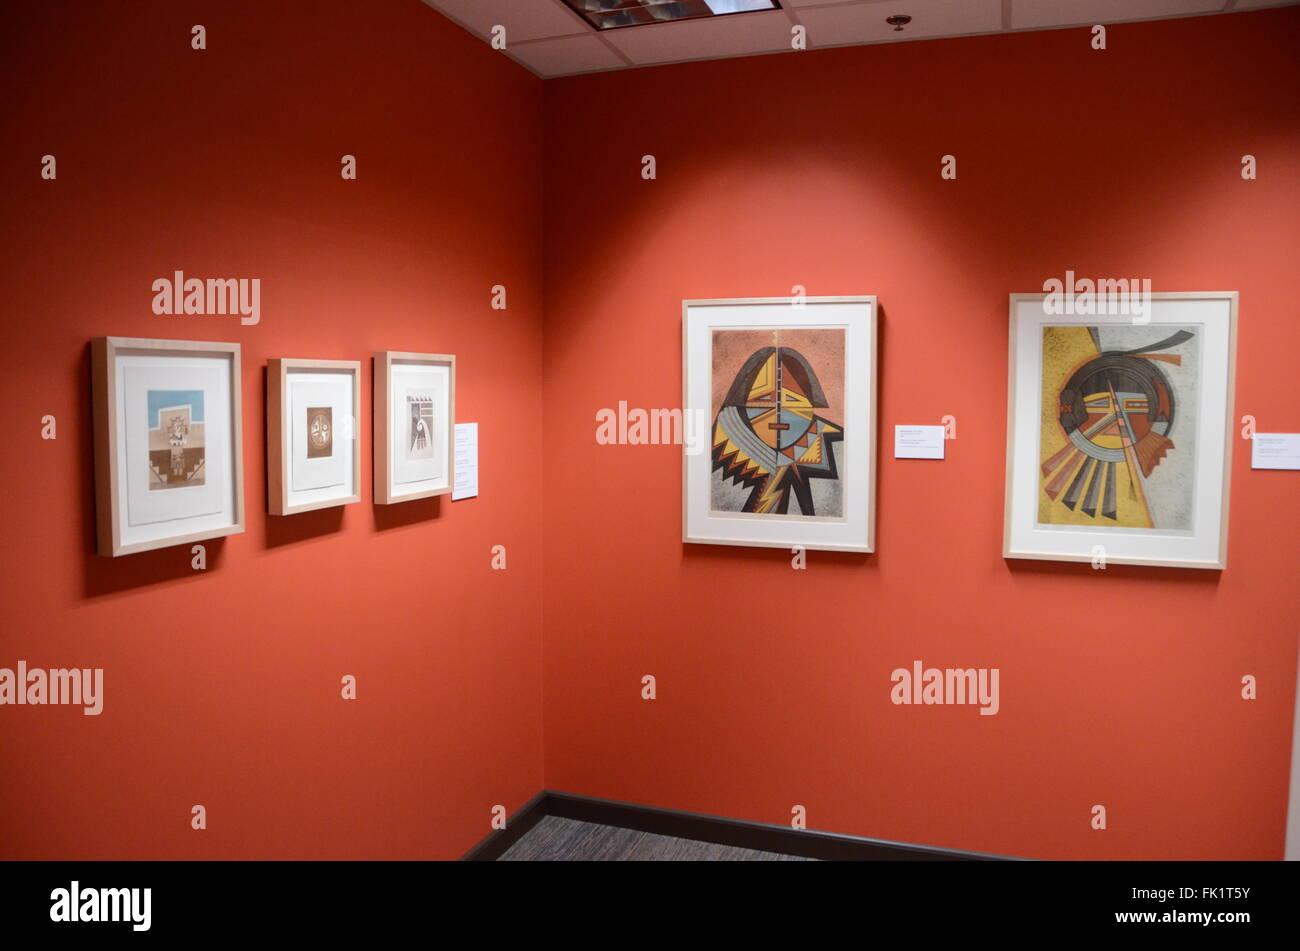 Phoenix Art Museum Stock Photos & Phoenix Art Museum Stock